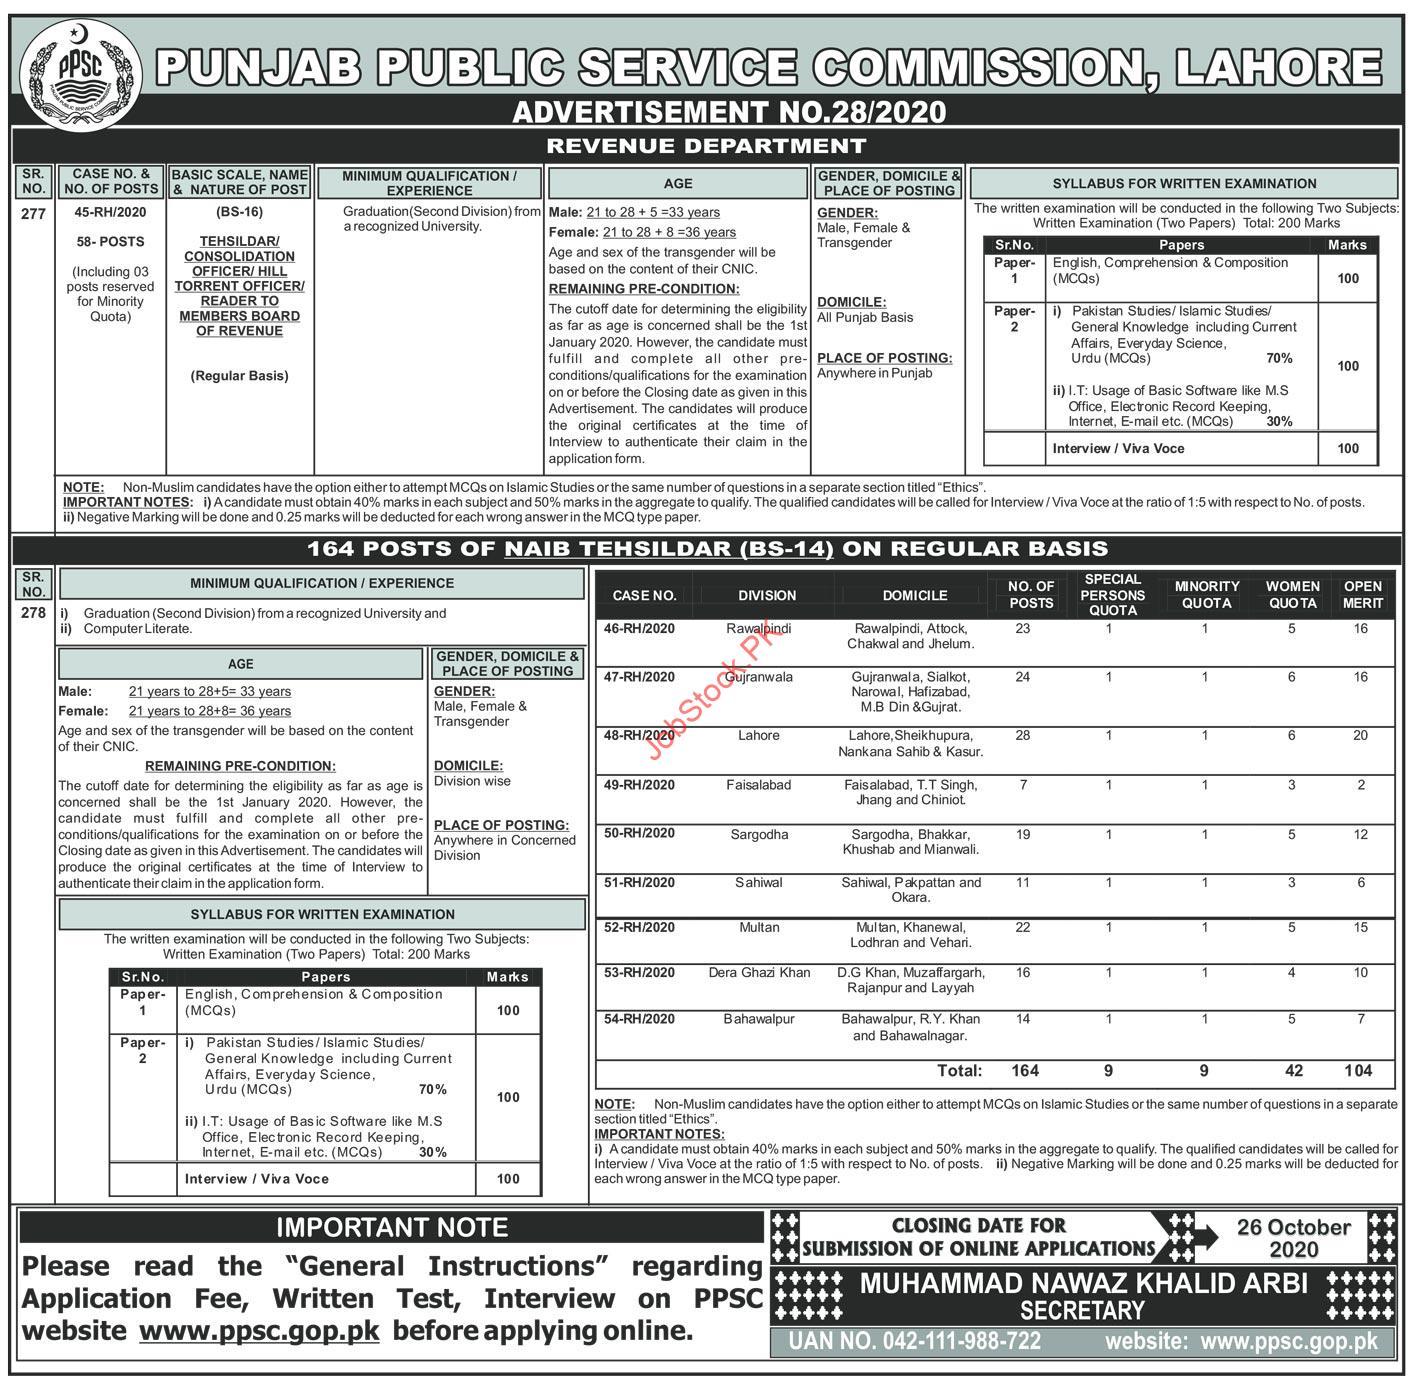 Ppsc Jobs 2020 Latest Advertisement No.282020 Apply Online